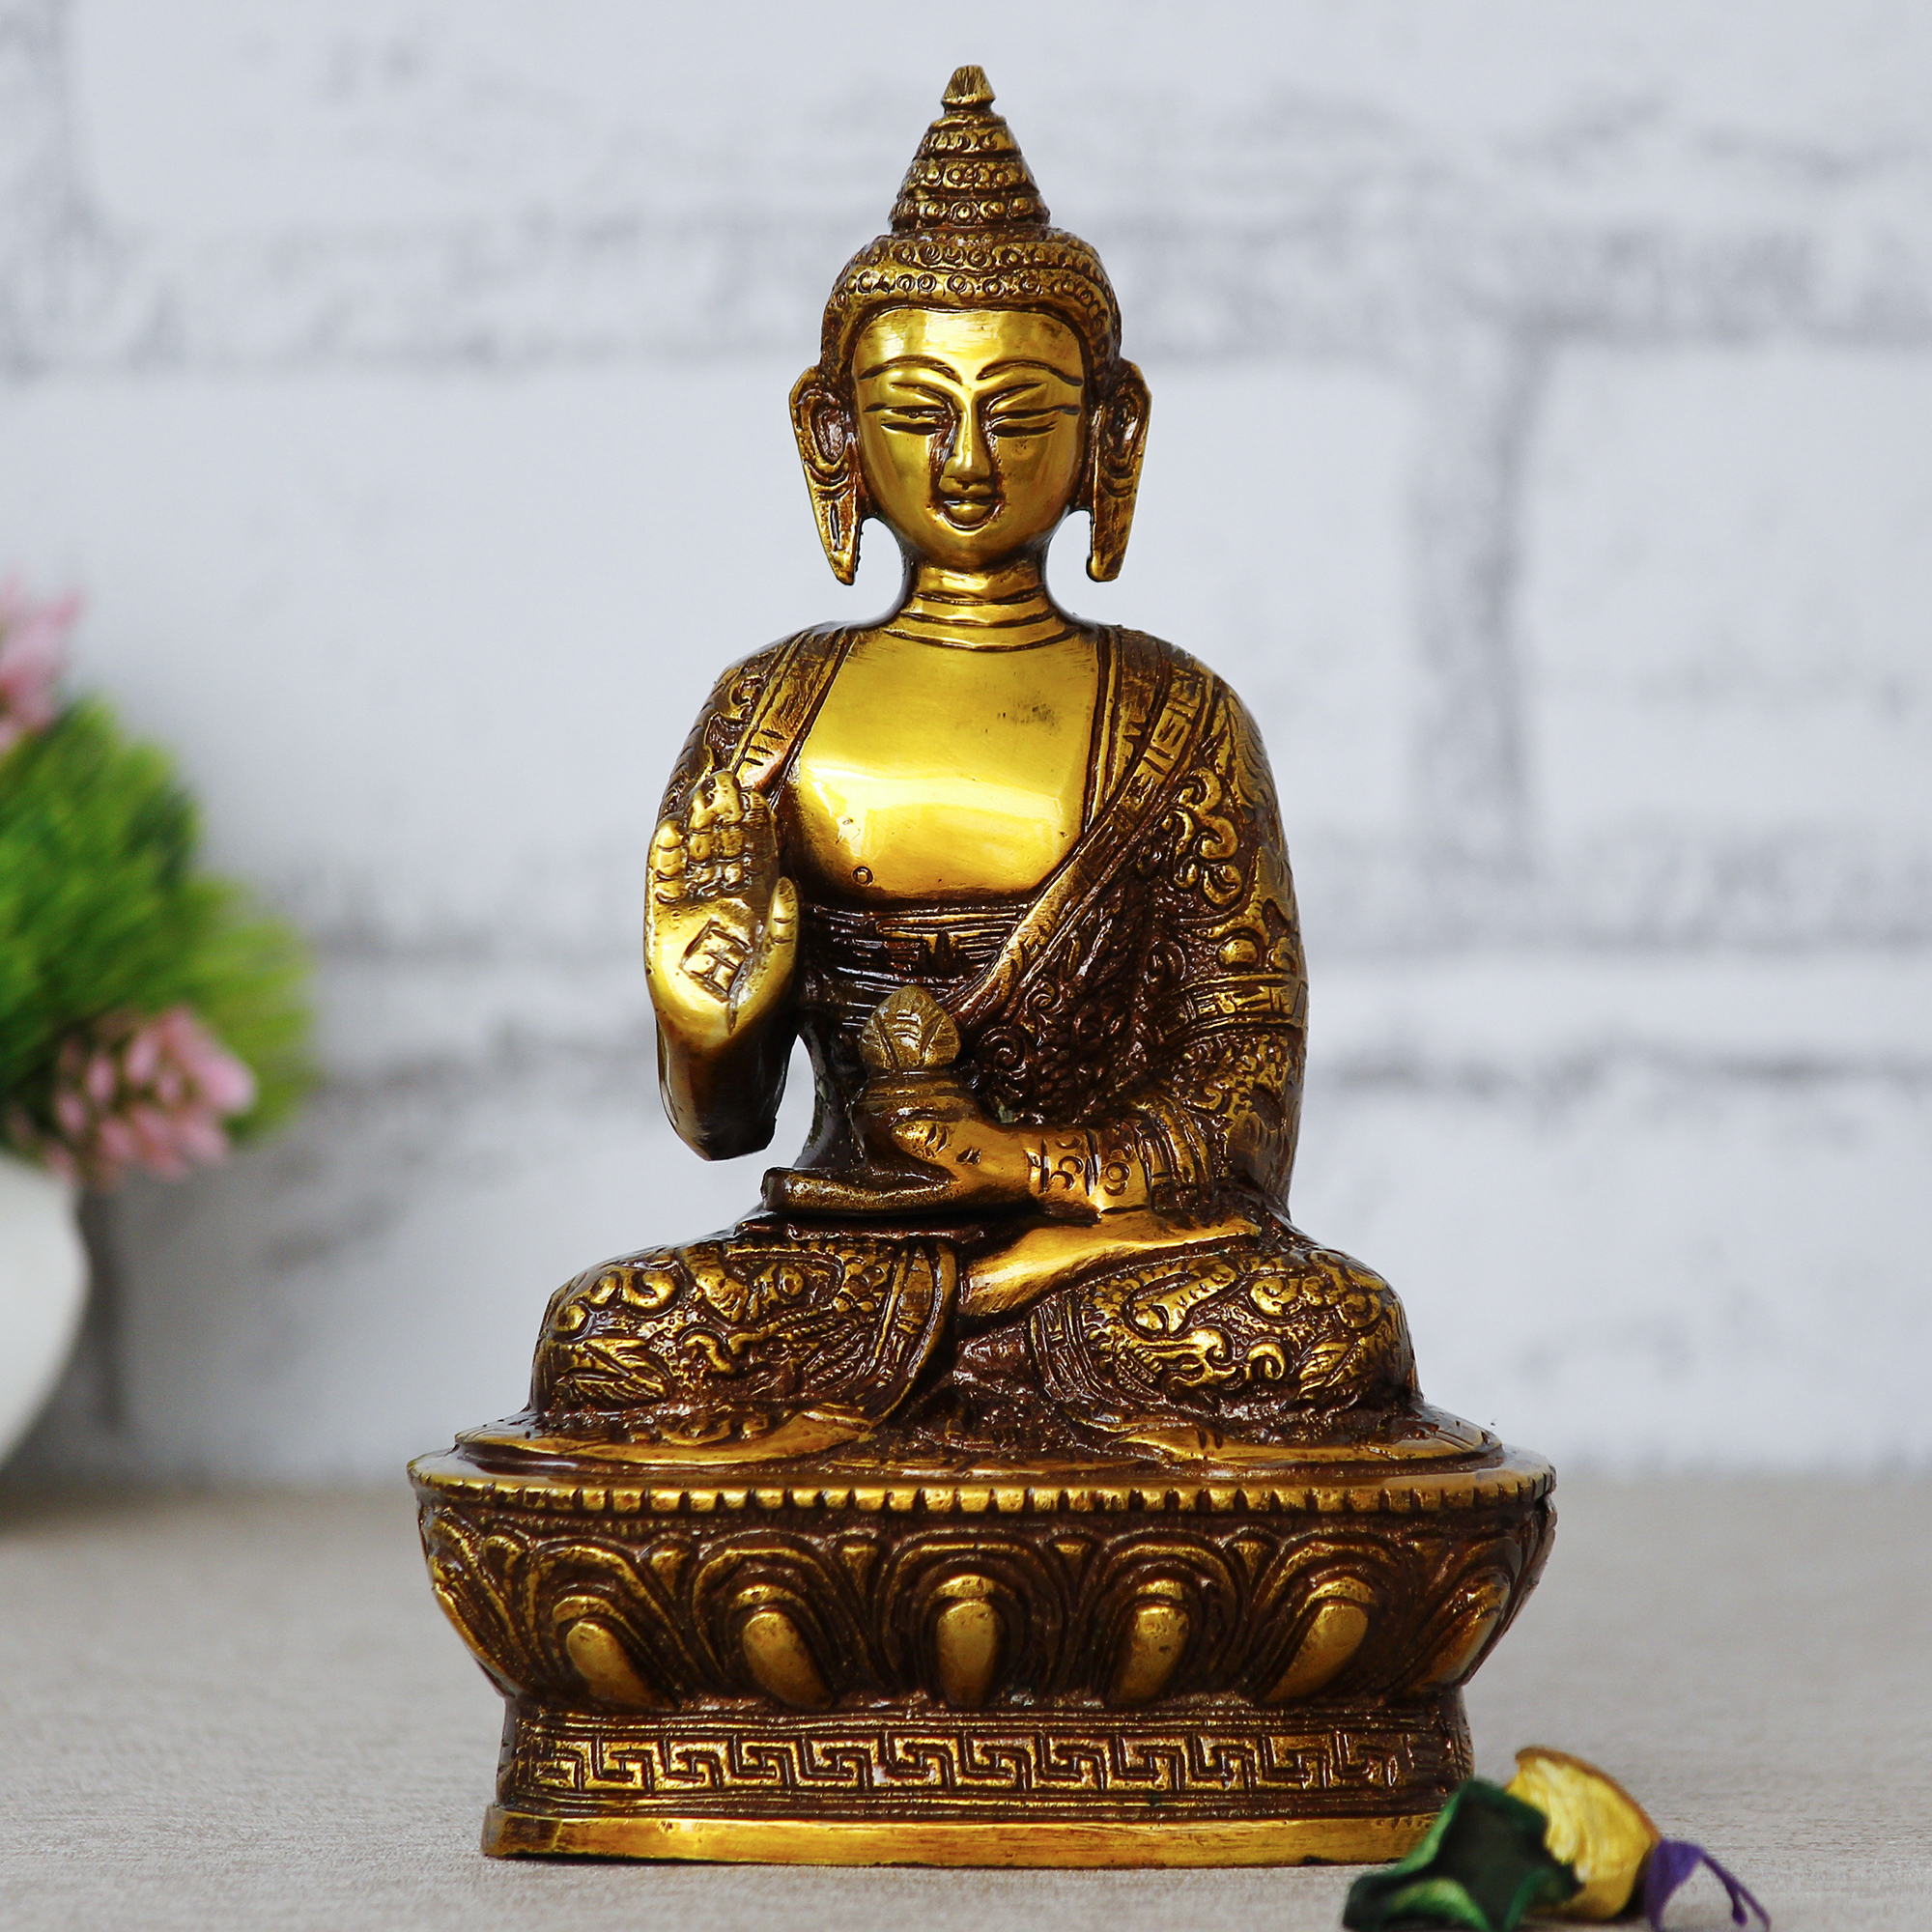 Golden Premium Meditating Blessing Buddha Brass Antique Artifact Indian Home Decor